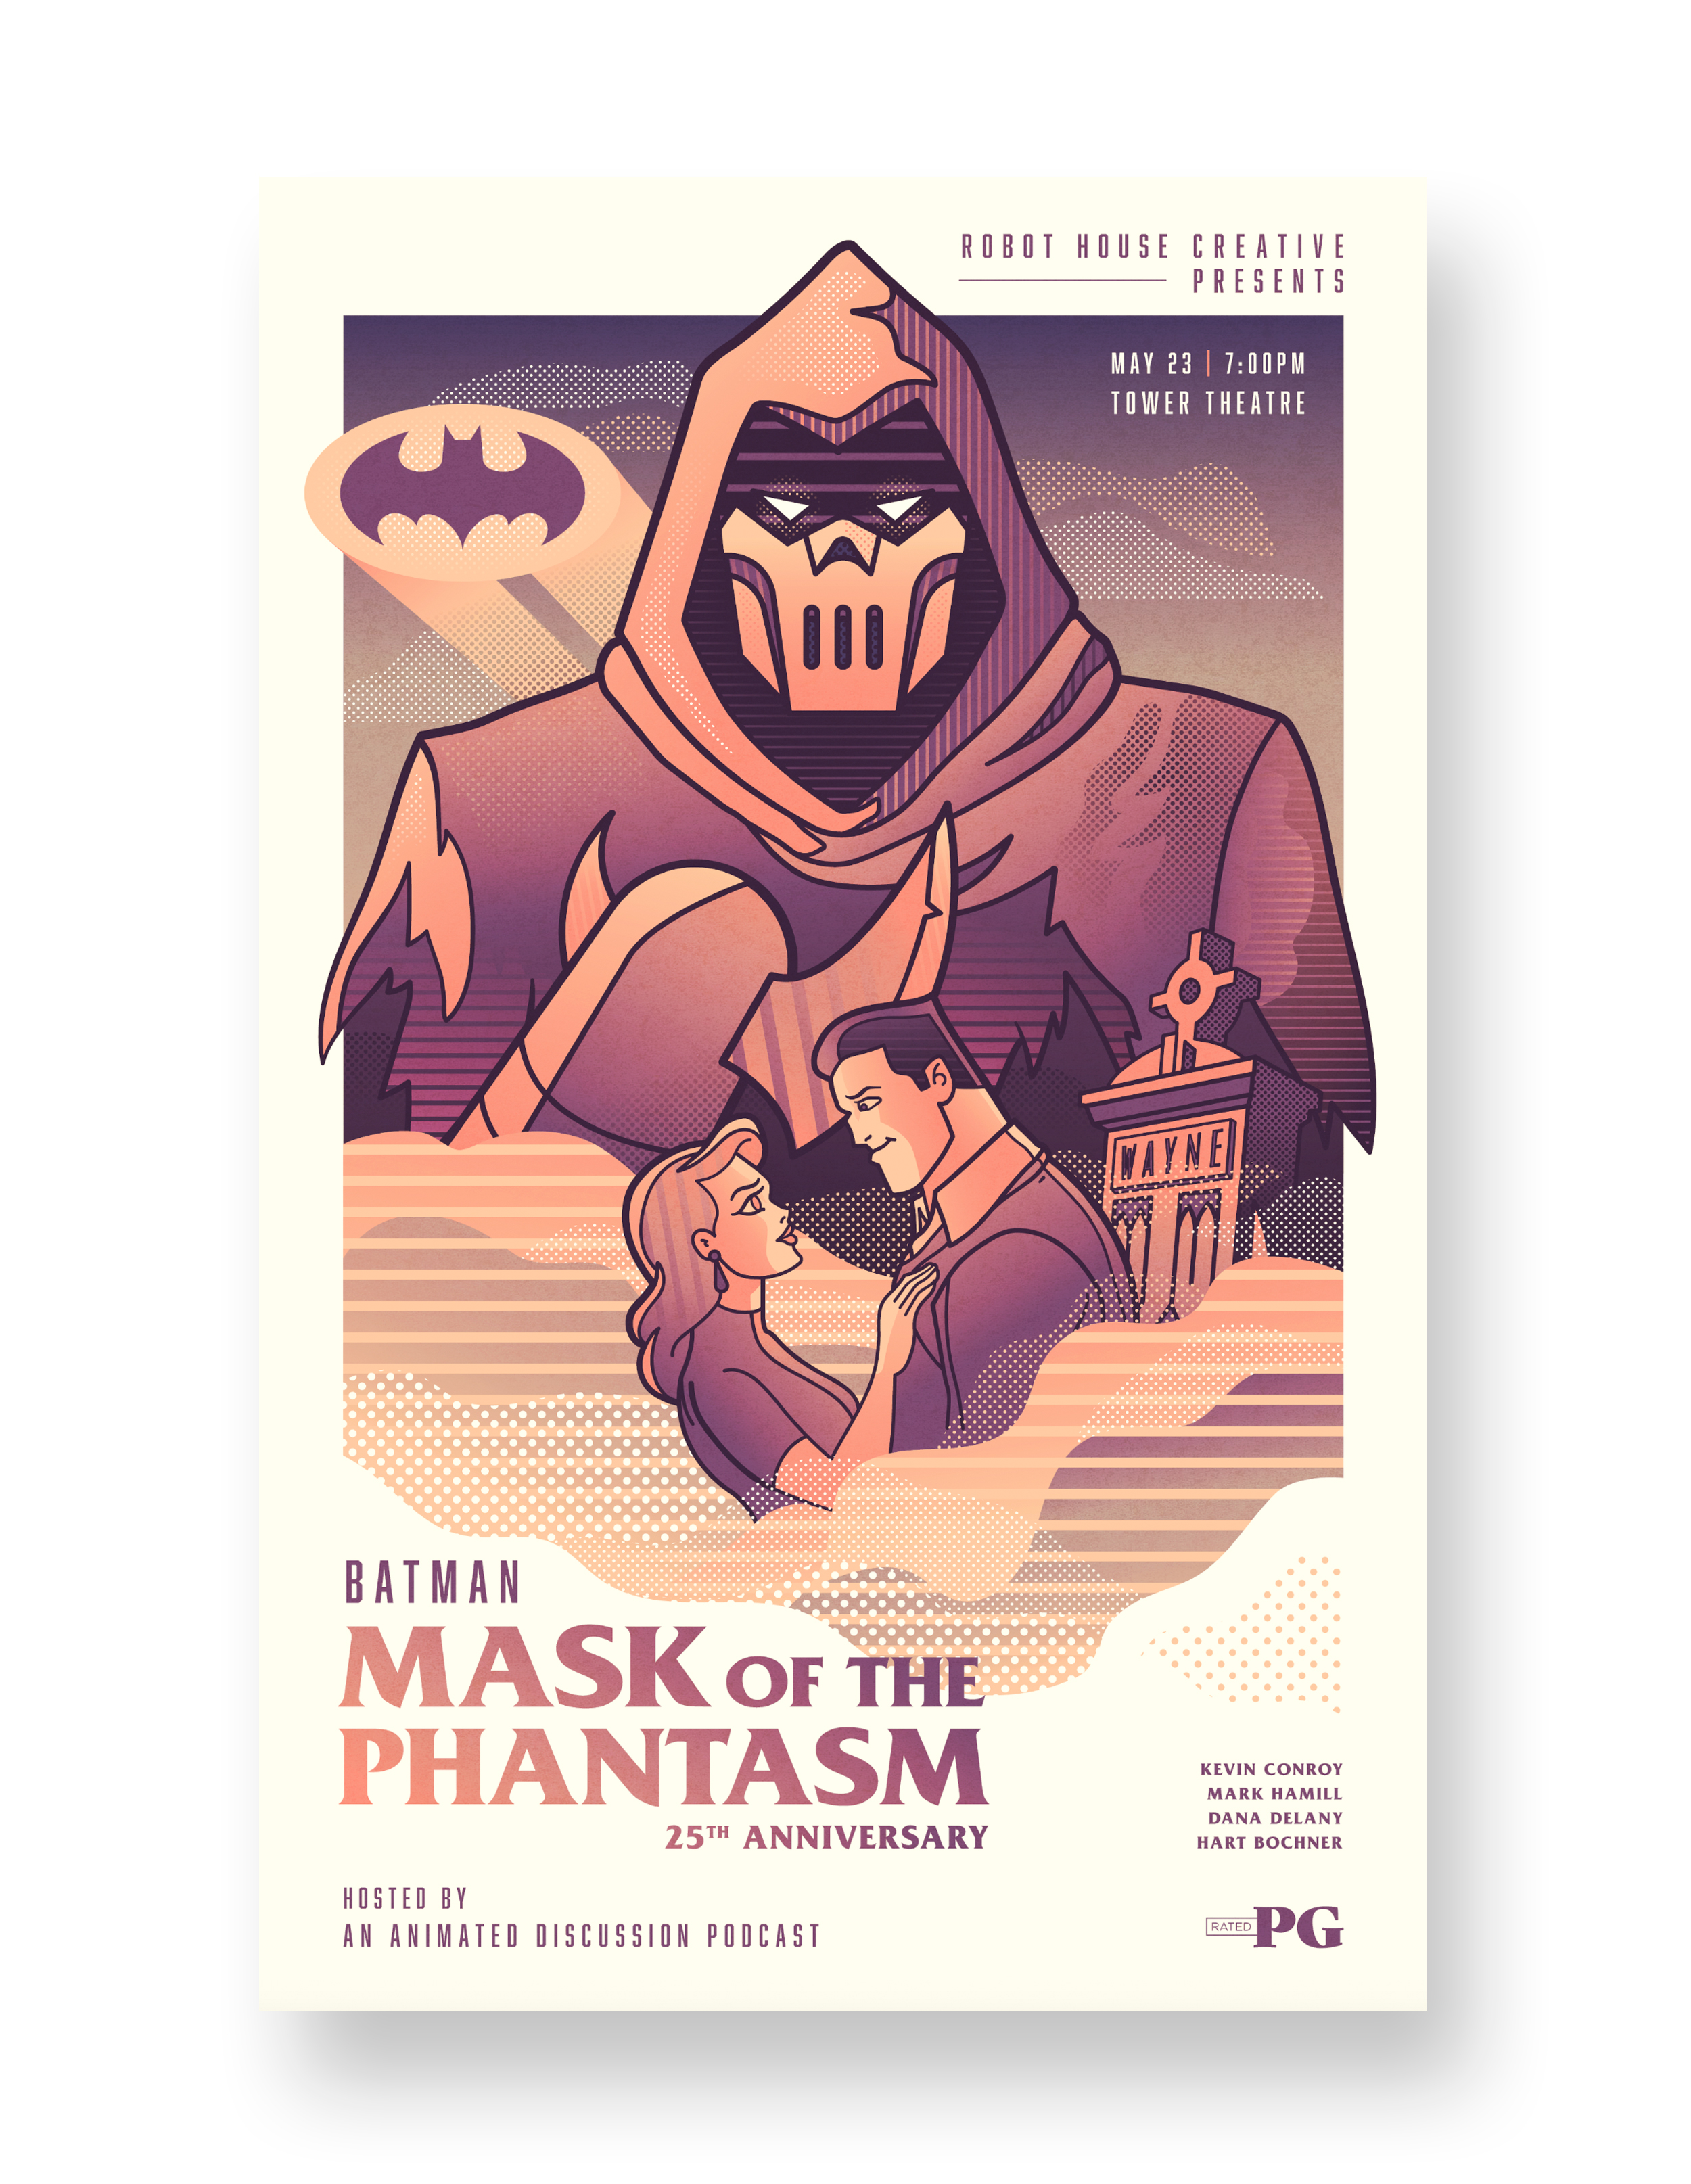 BATMAN MASK OF THE PHANTASM TOWER THEATRE VARIANT